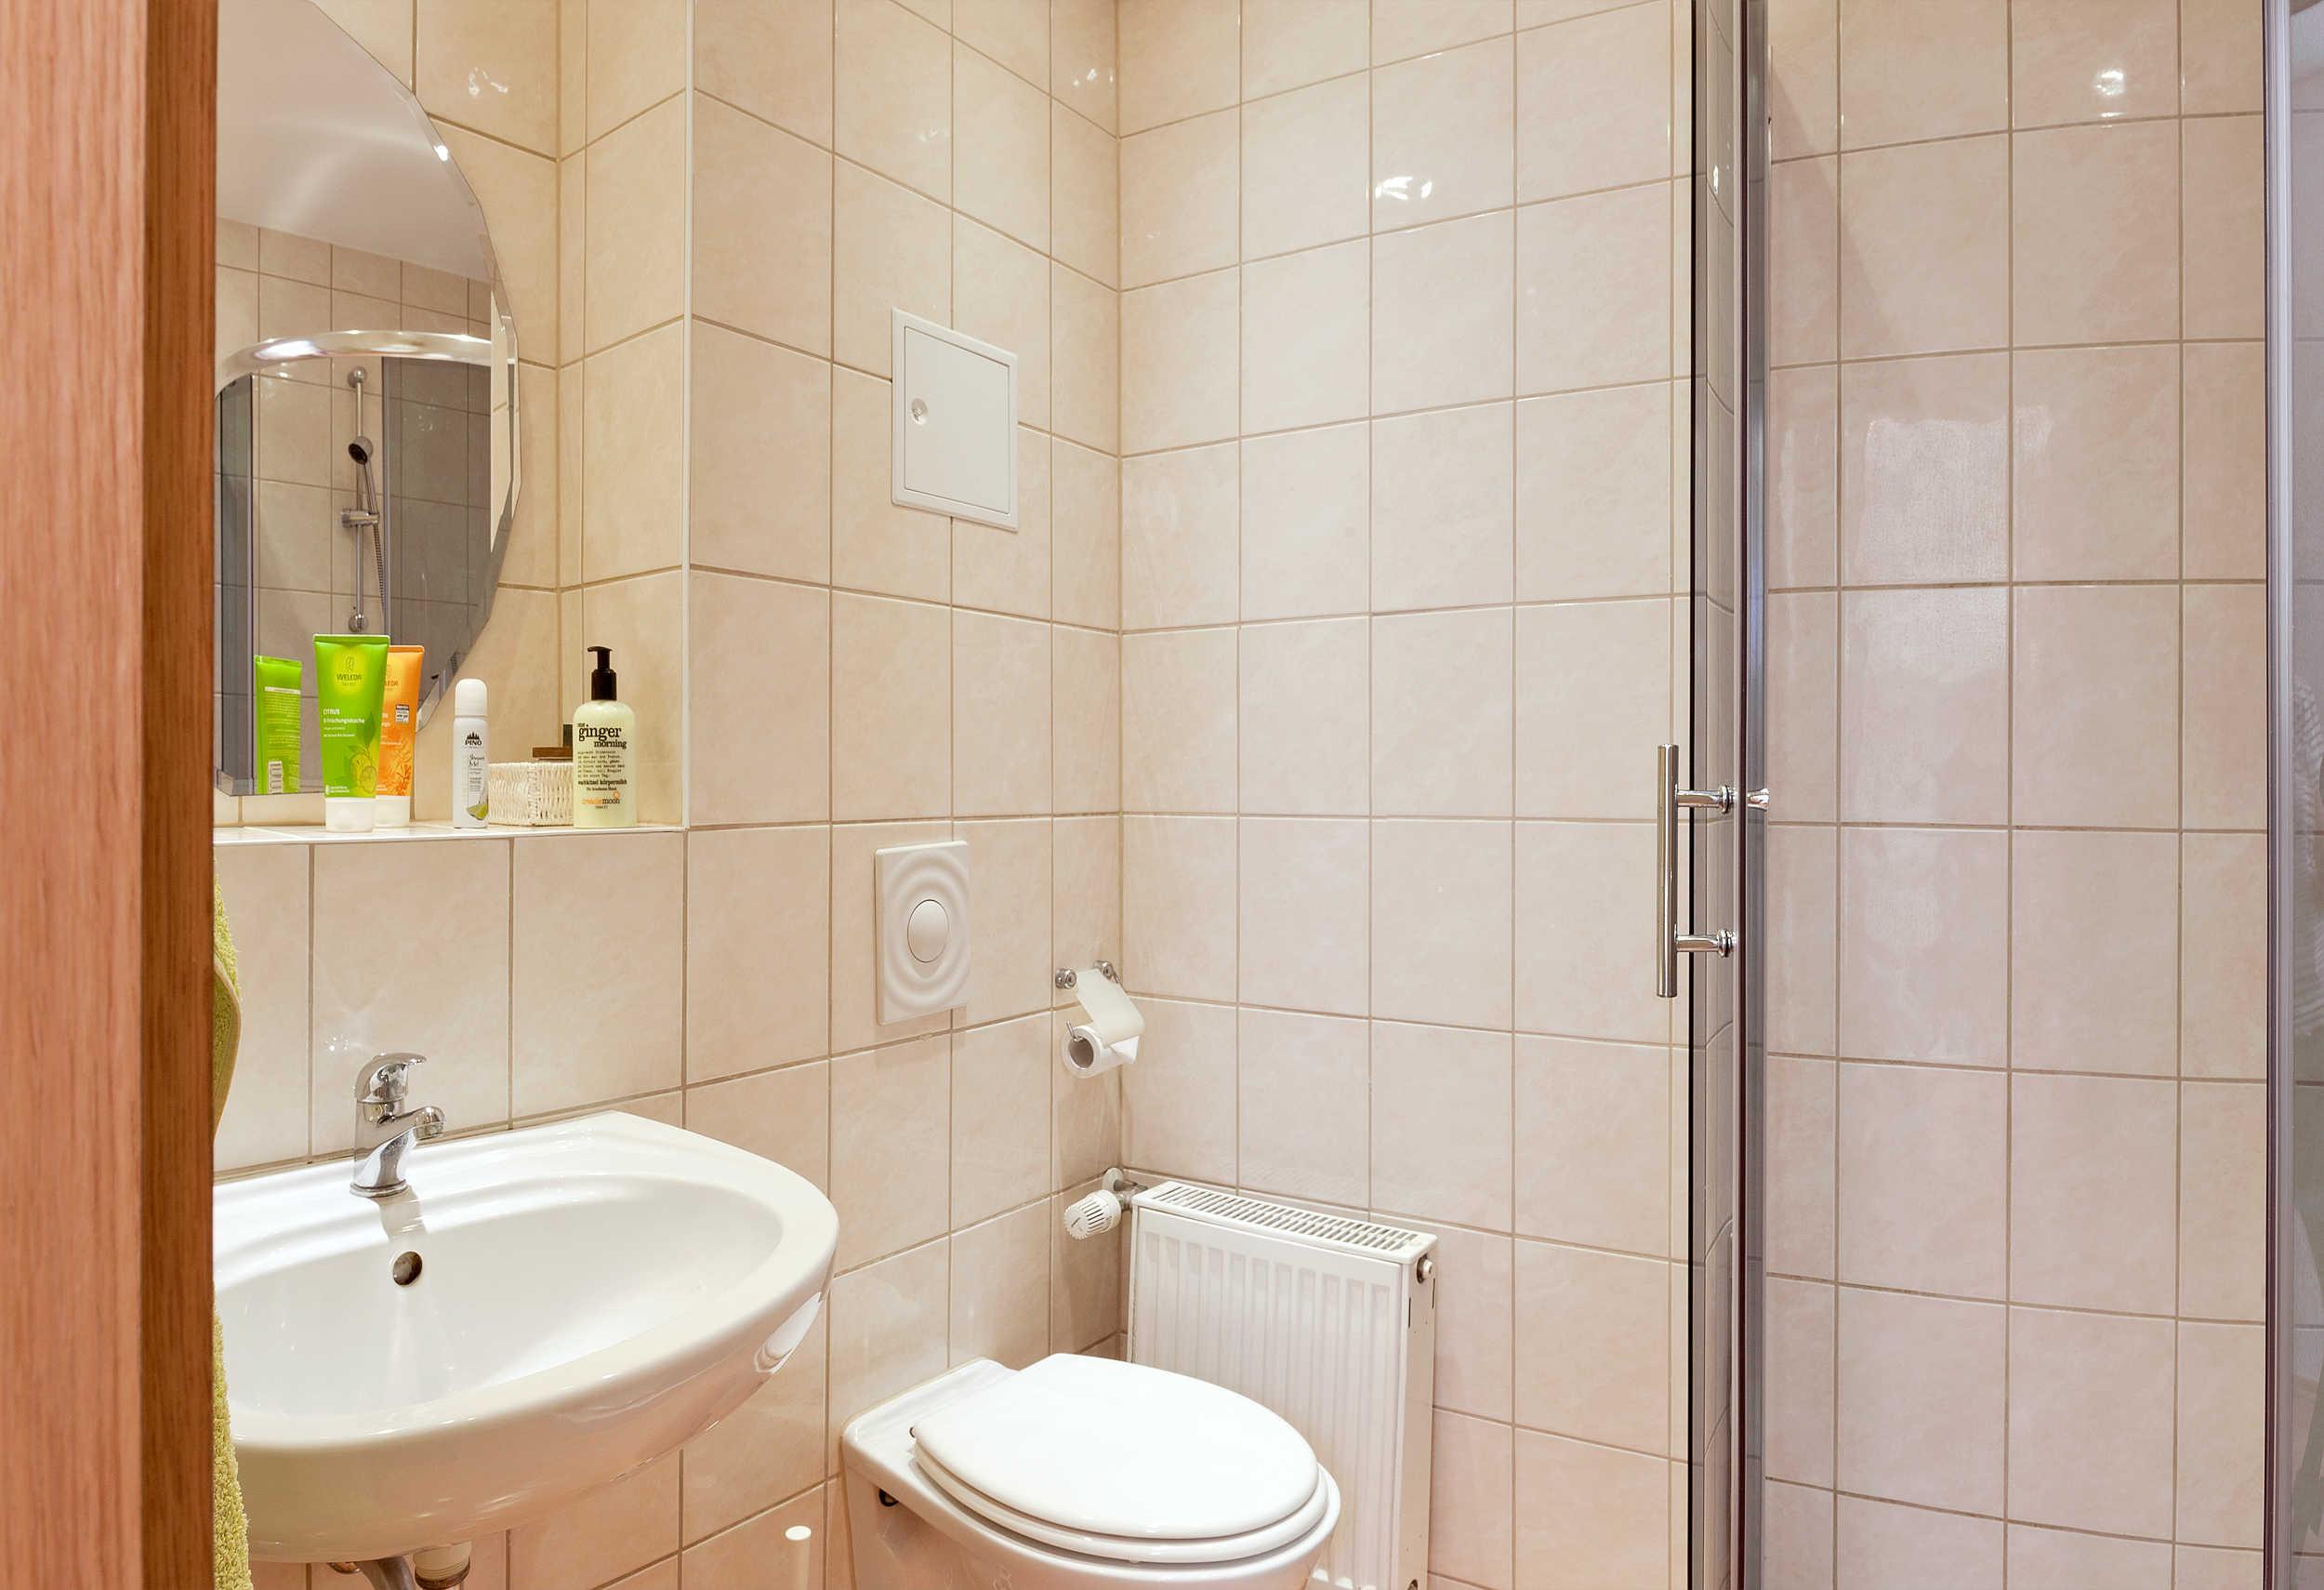 ferienwohnung 3 villa viamar. Black Bedroom Furniture Sets. Home Design Ideas